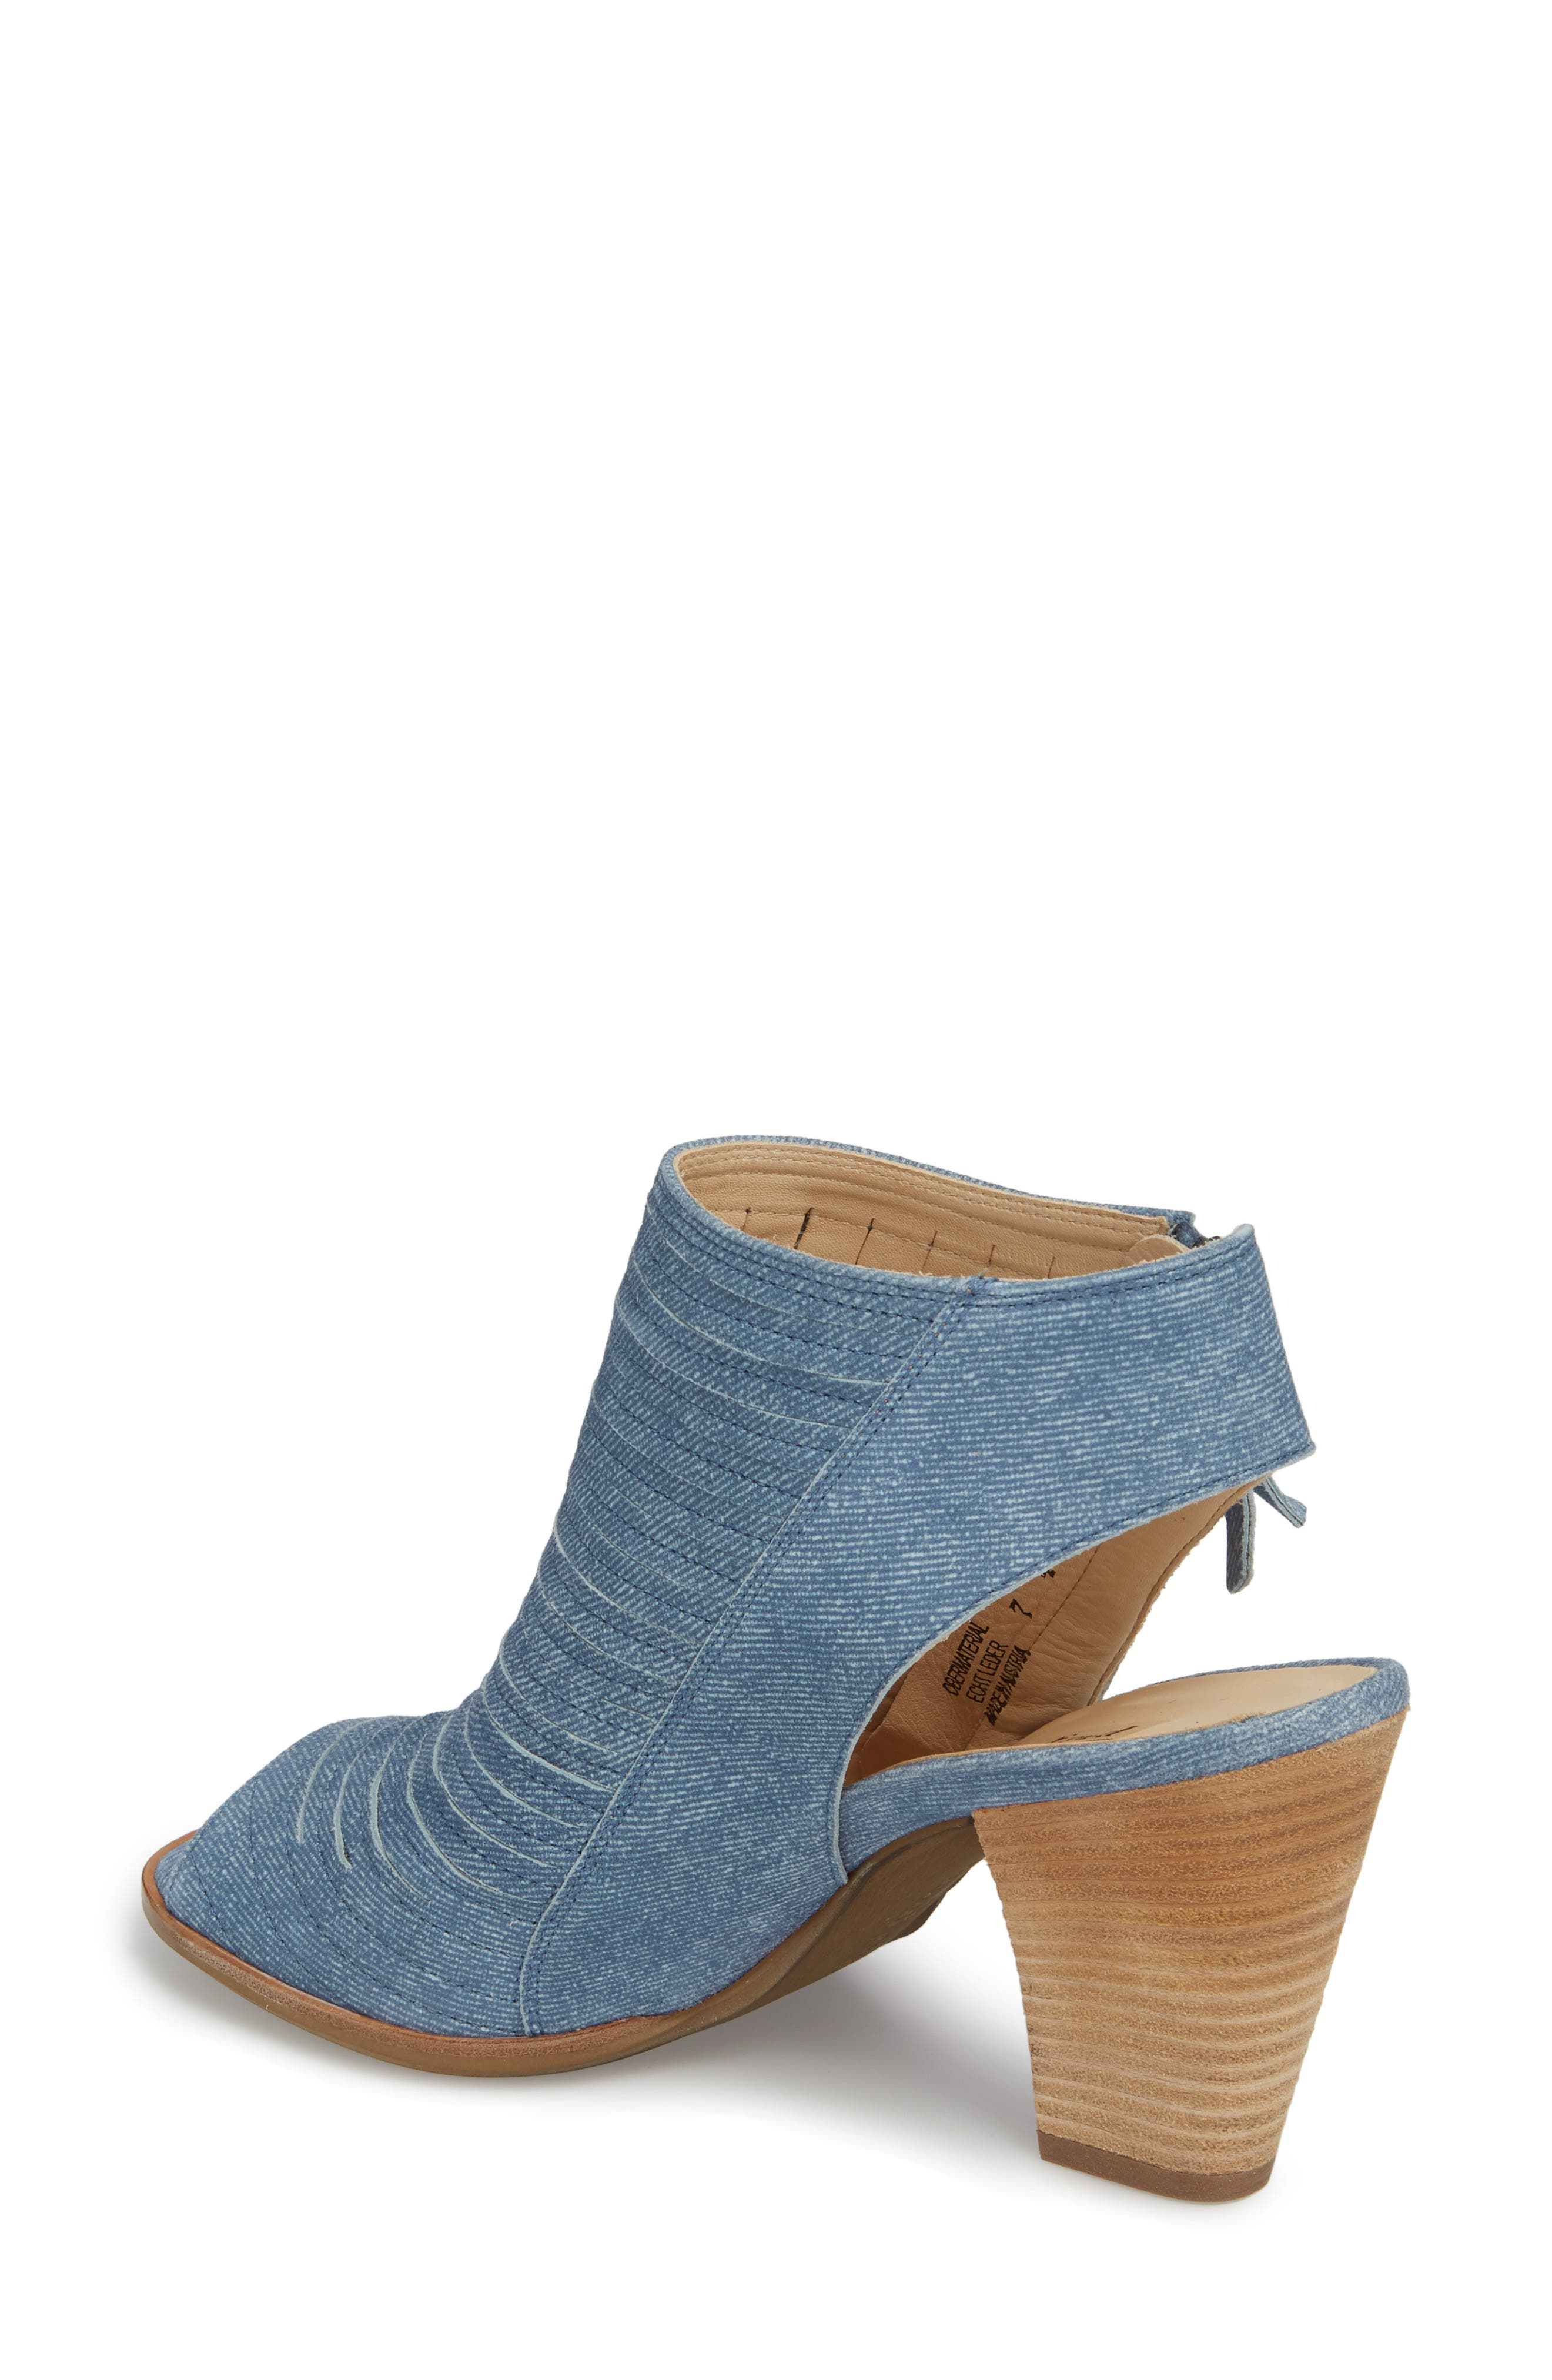 'Cayanne' Leather Peep Toe Sandal,                             Alternate thumbnail 11, color,